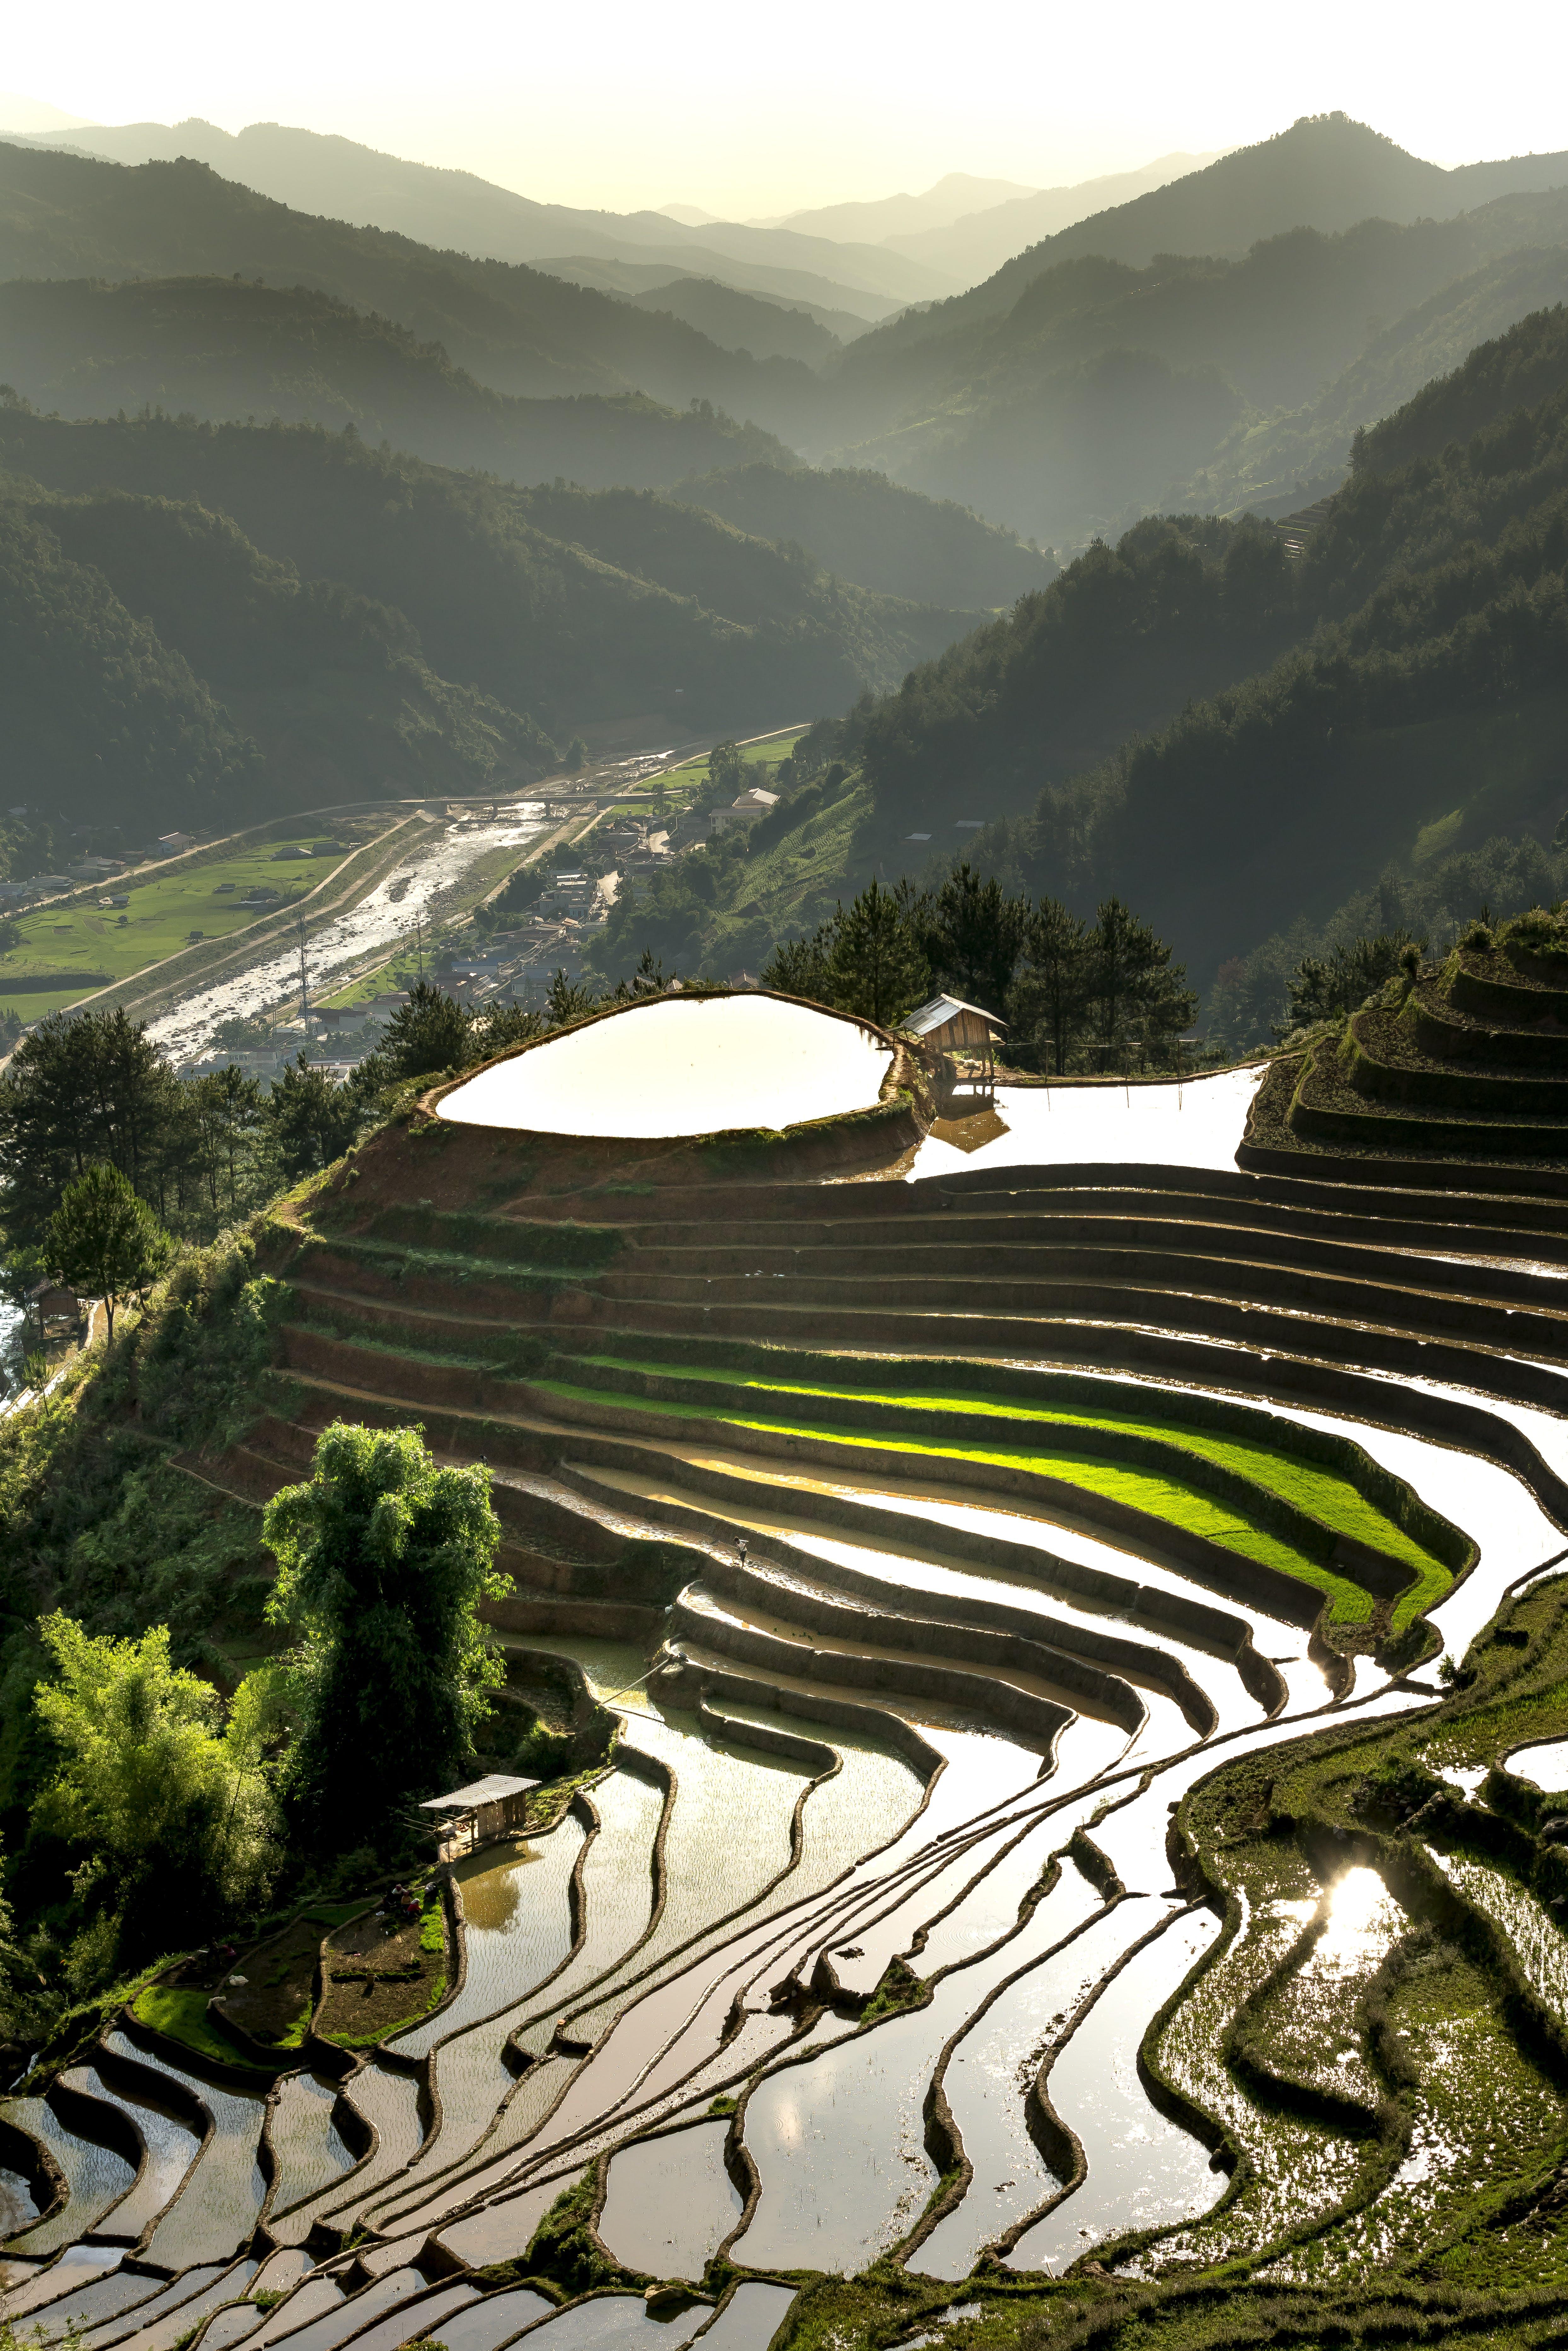 Gratis stockfoto met akkerland, berg, boerderij, boerenbedrijf